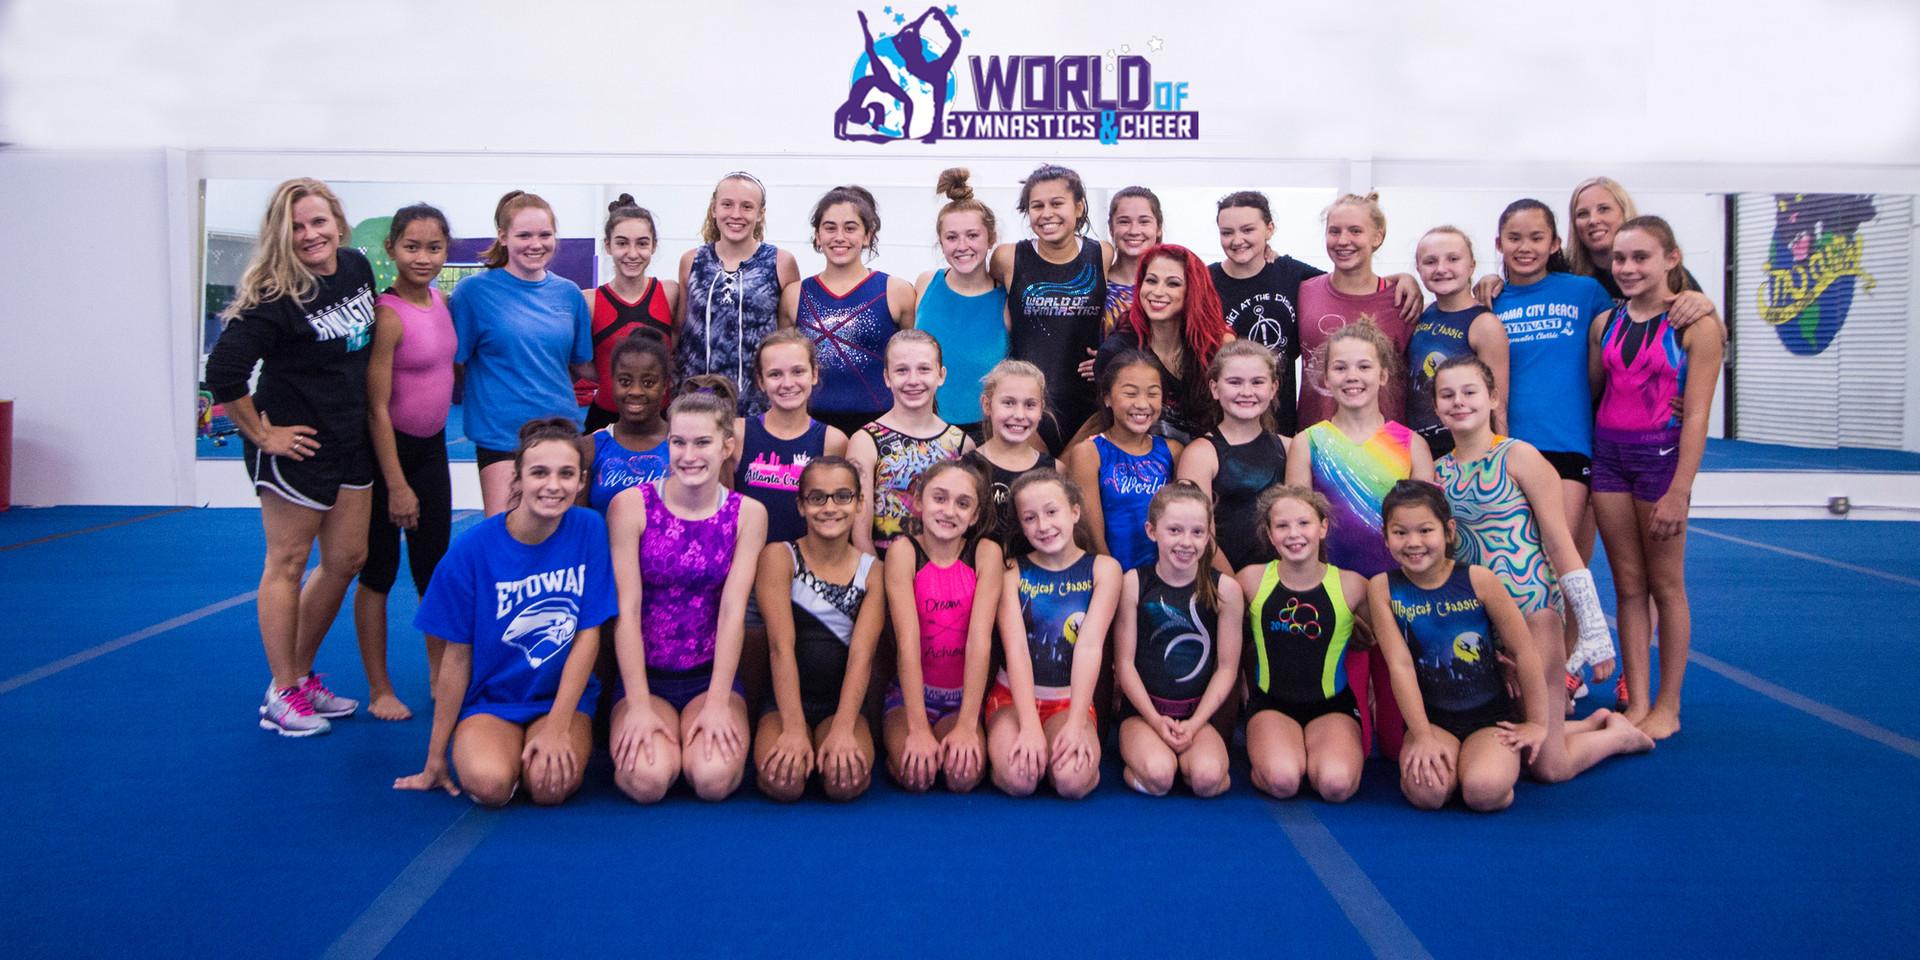 World of Gymnastic and Cheer Georgia